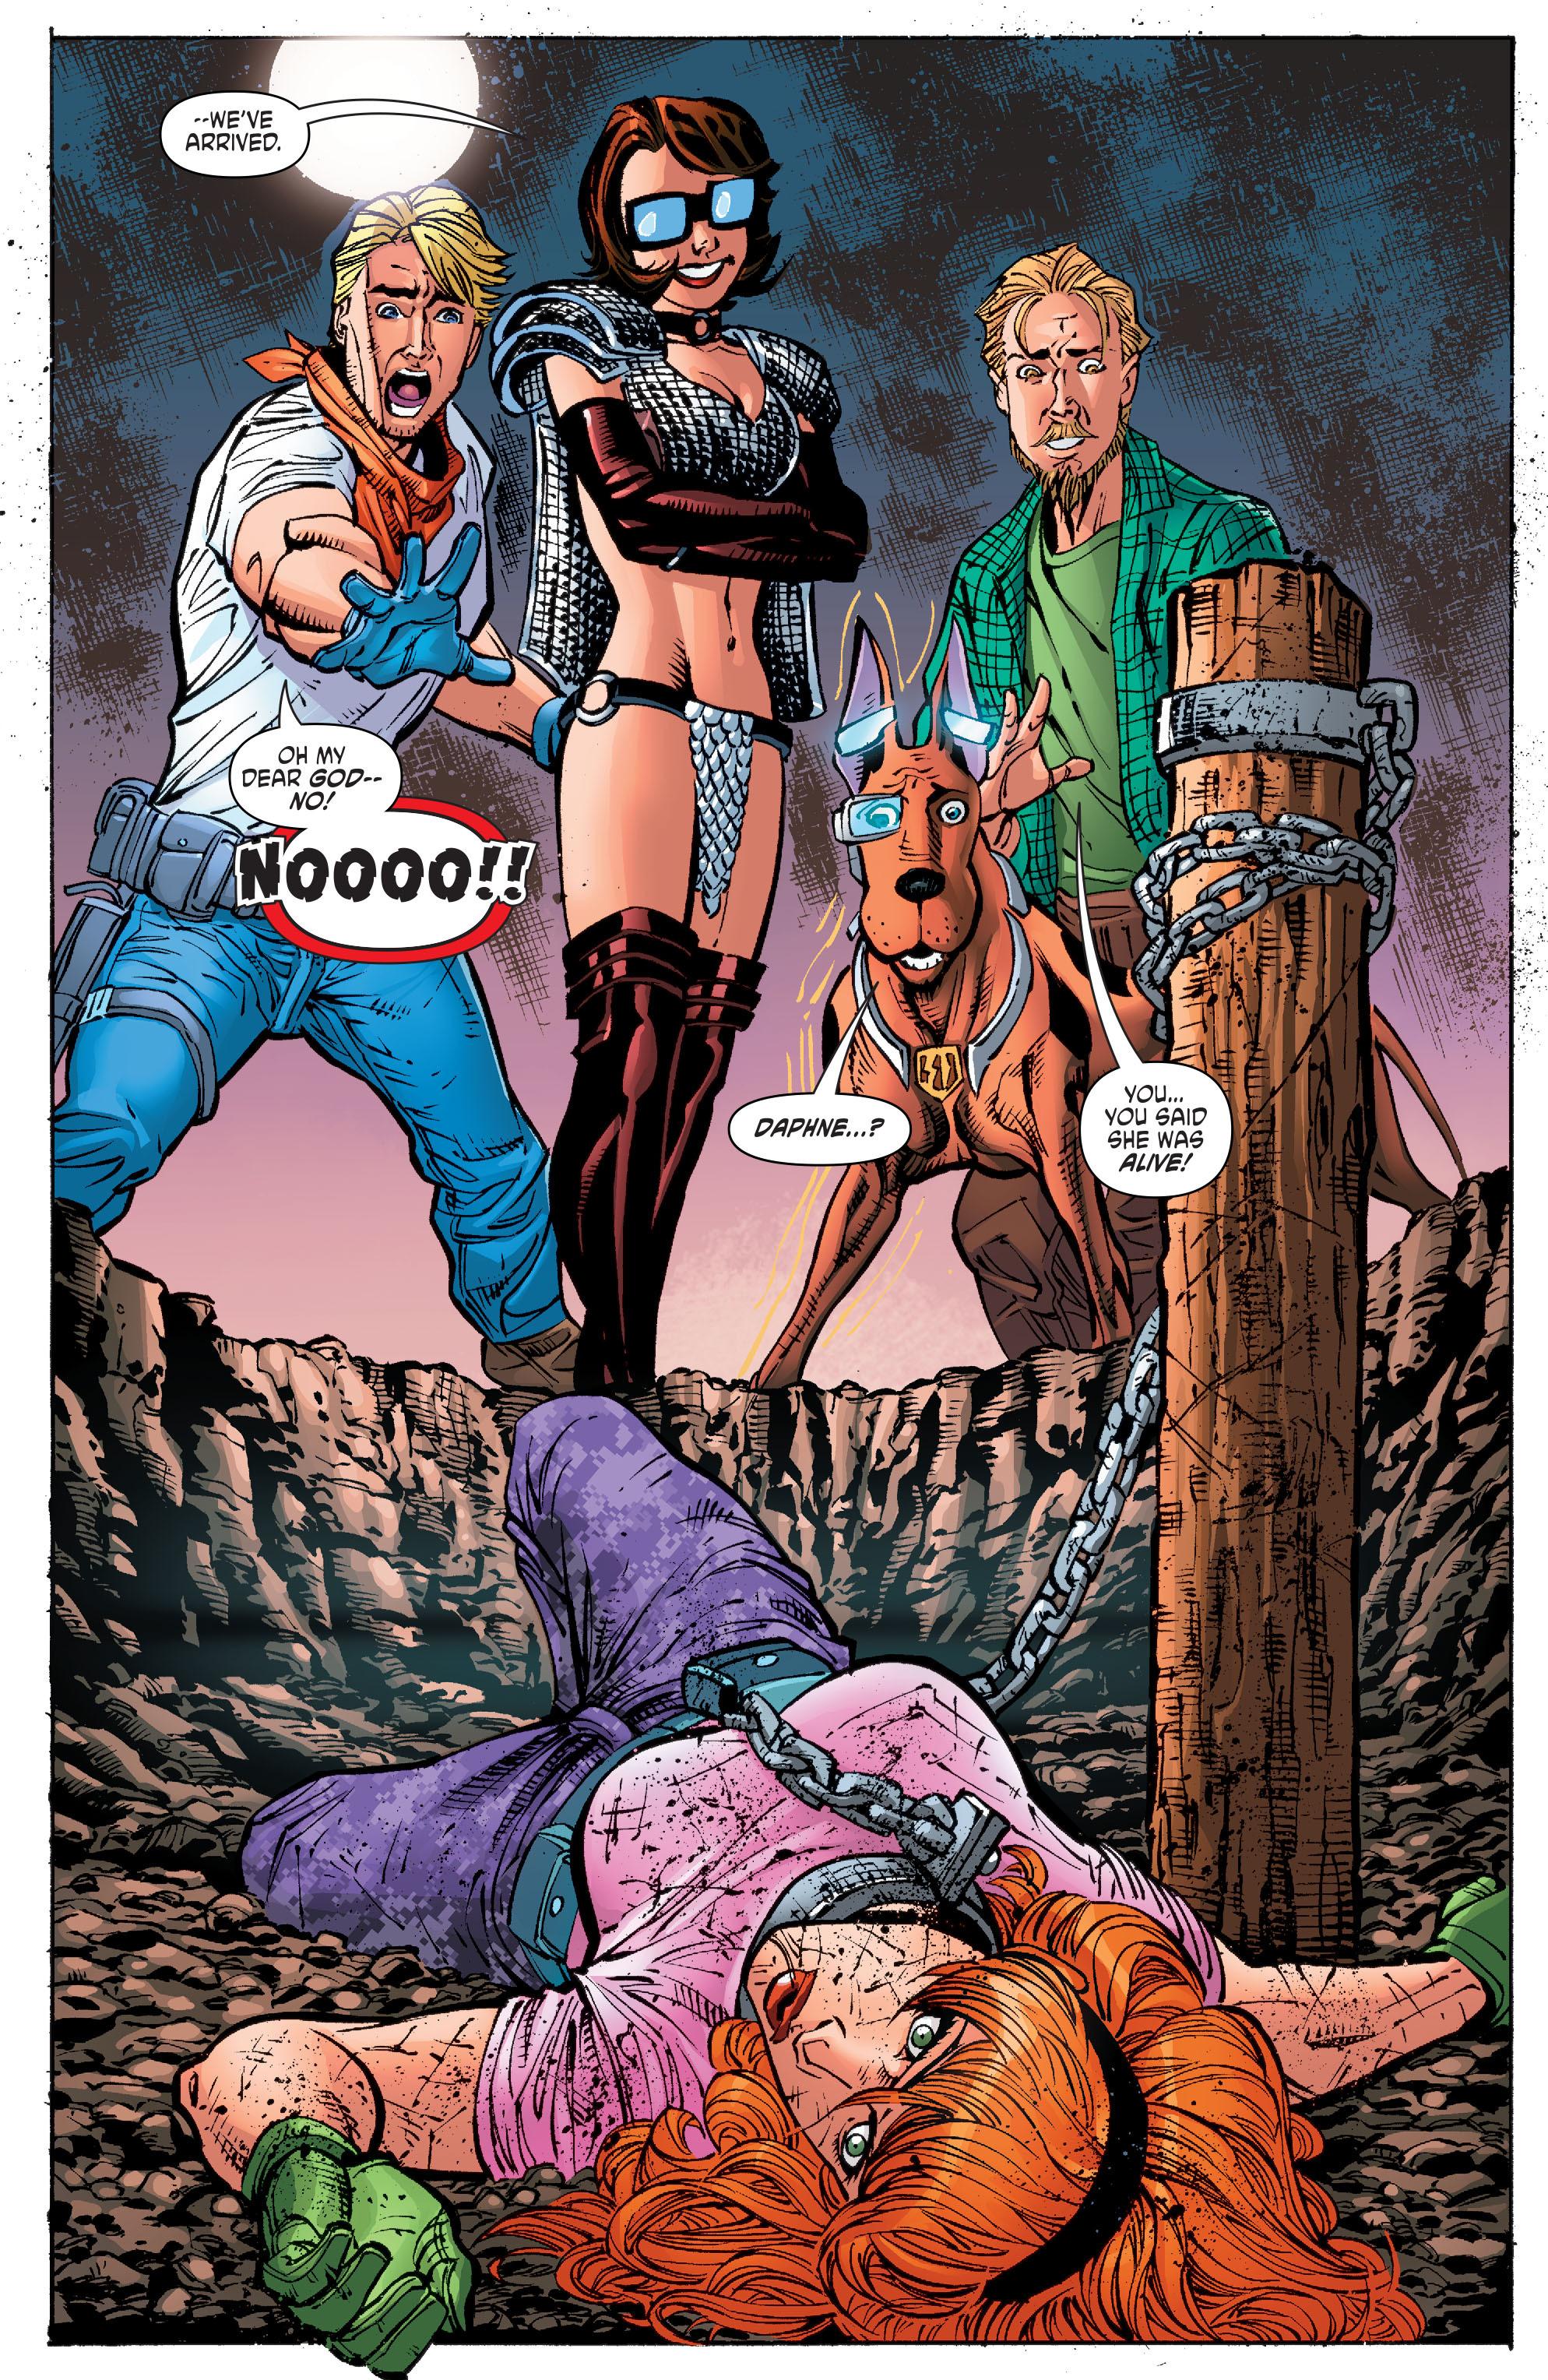 Read online Scooby Apocalypse comic -  Issue #10 - 20